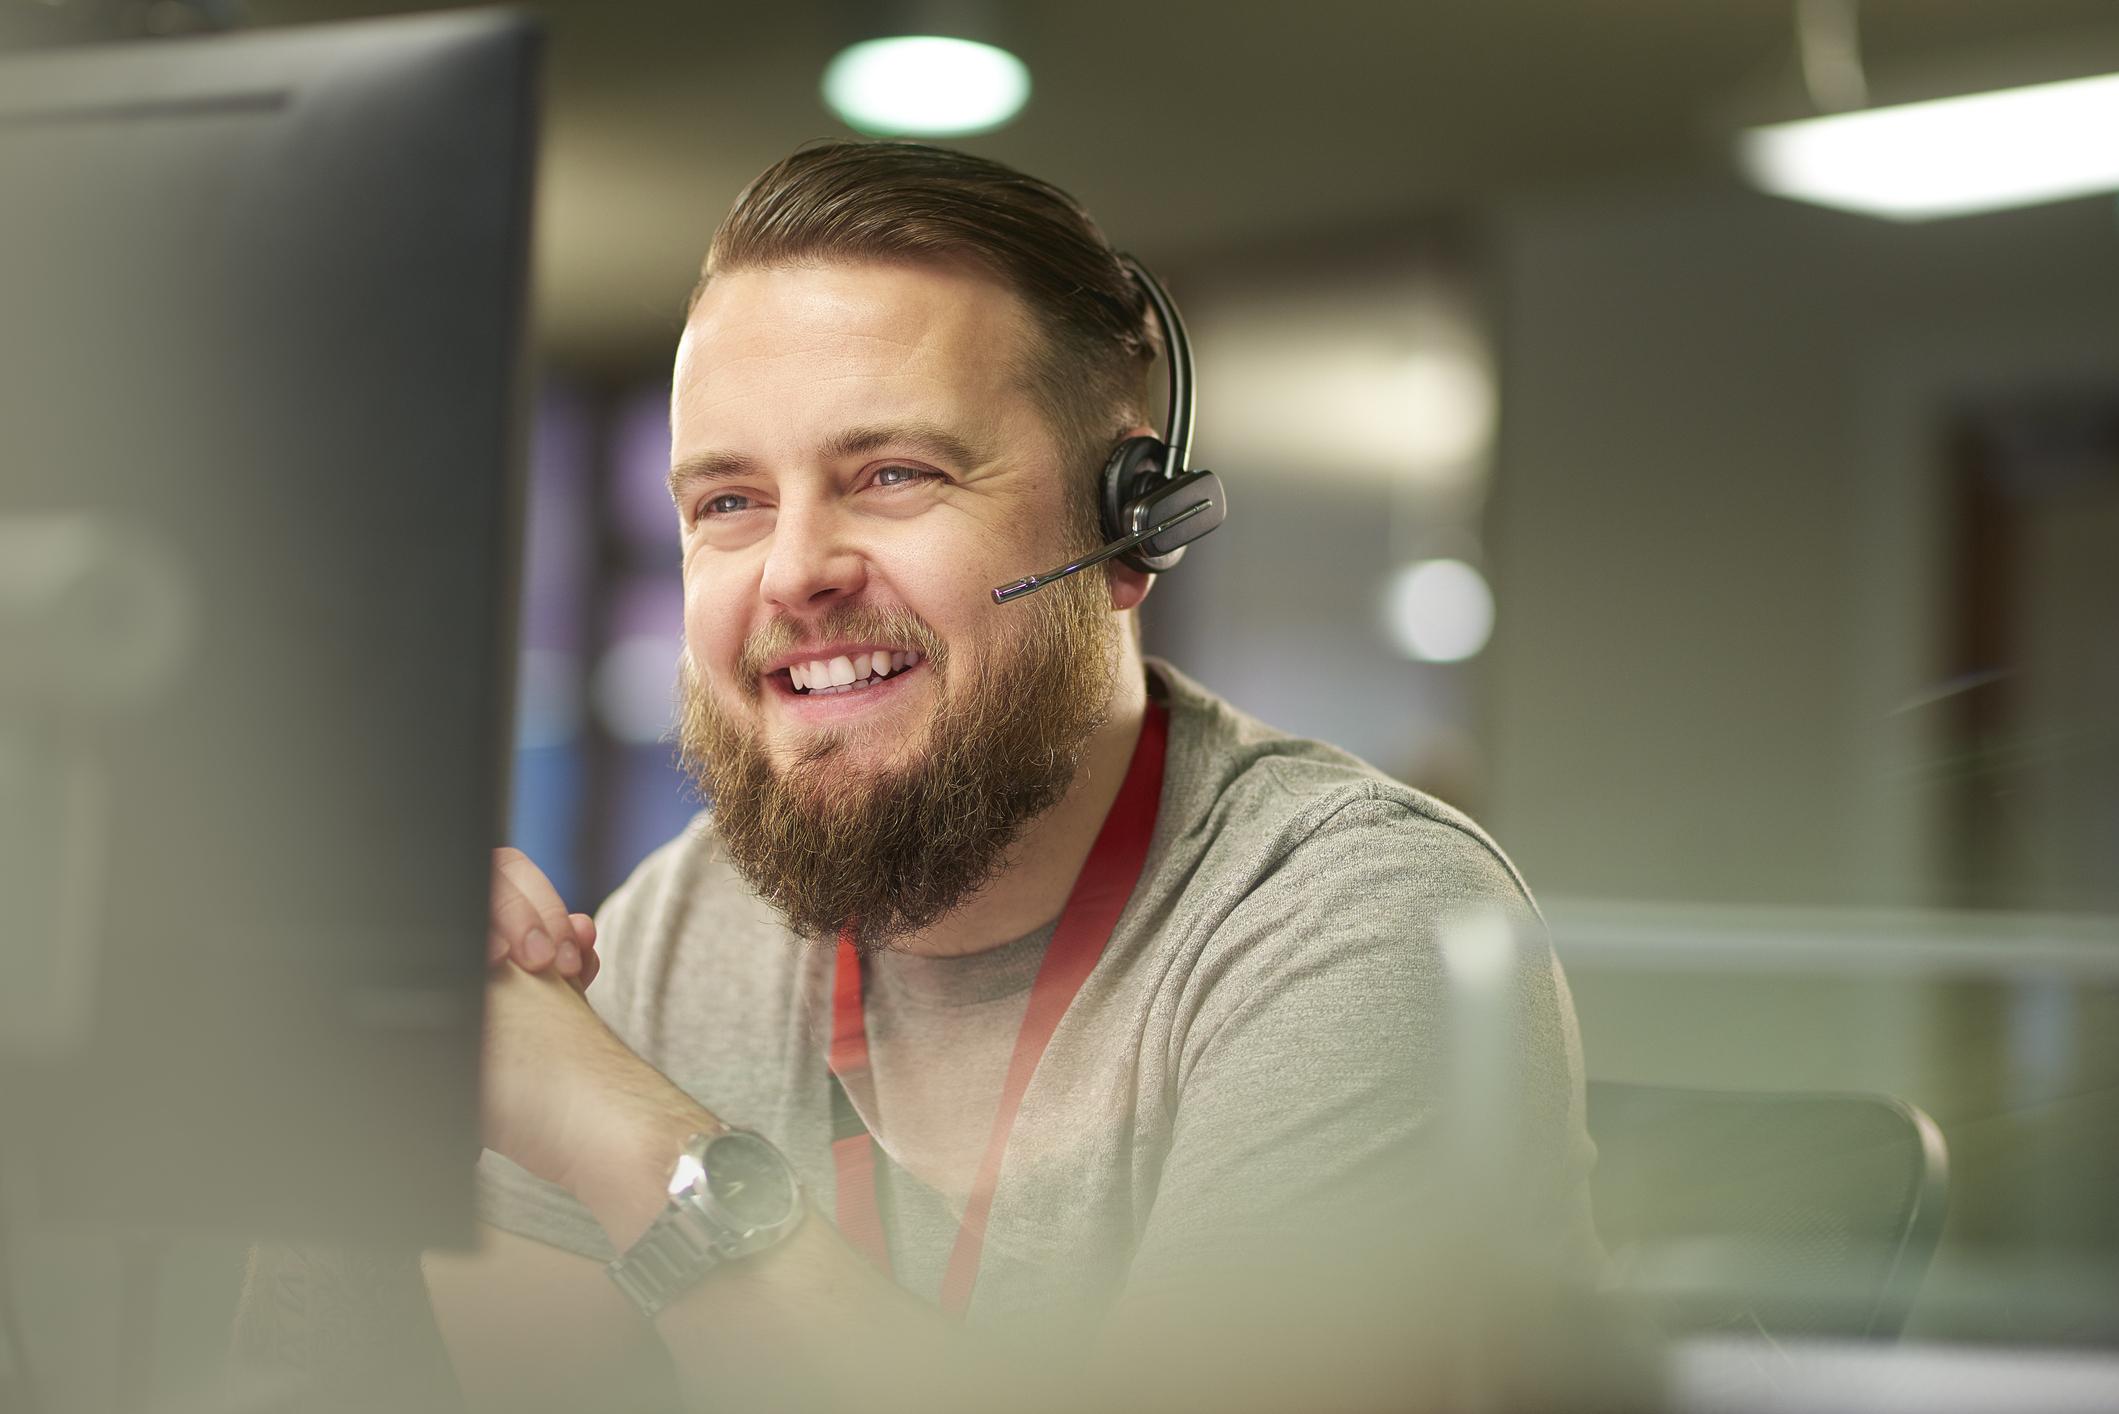 Male customer care representative with headset